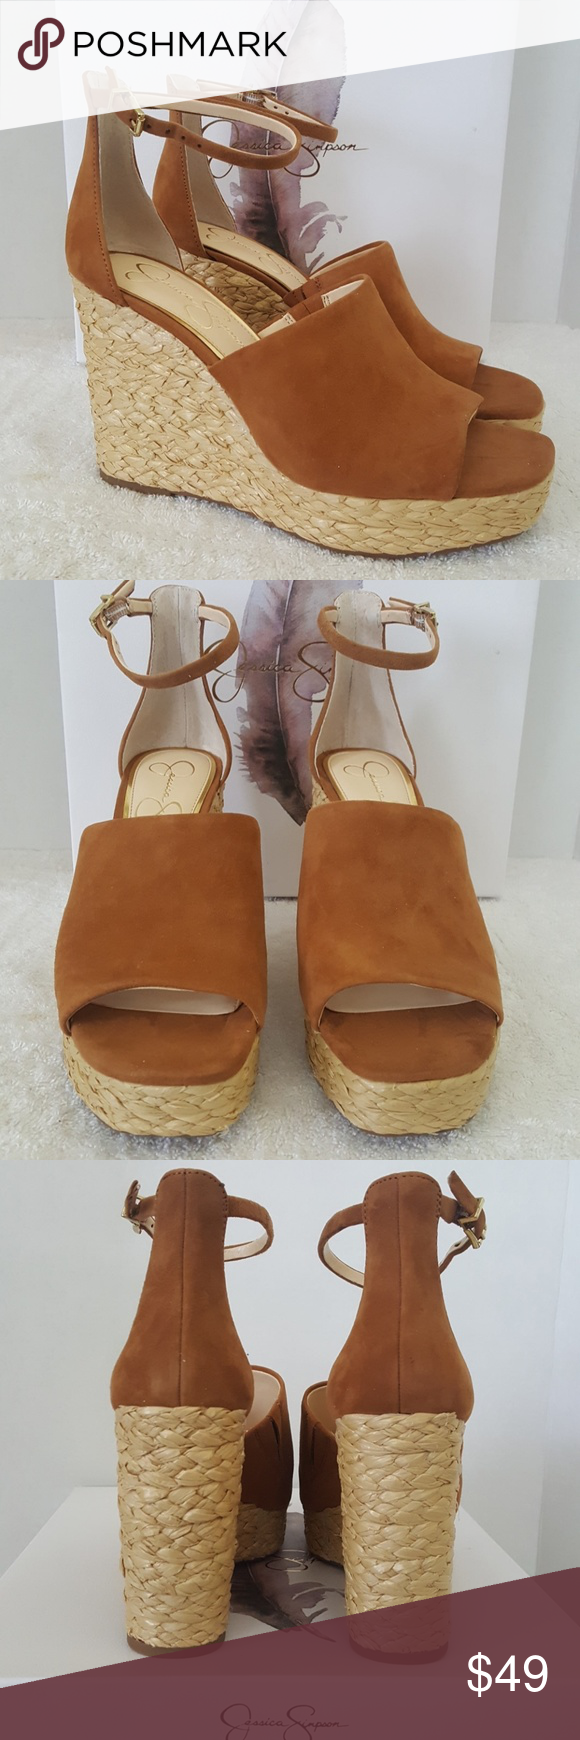 92db7b7ed27 Jessica Simpson Shoes | New Jessica Simpson Suella Leather Sandals ...